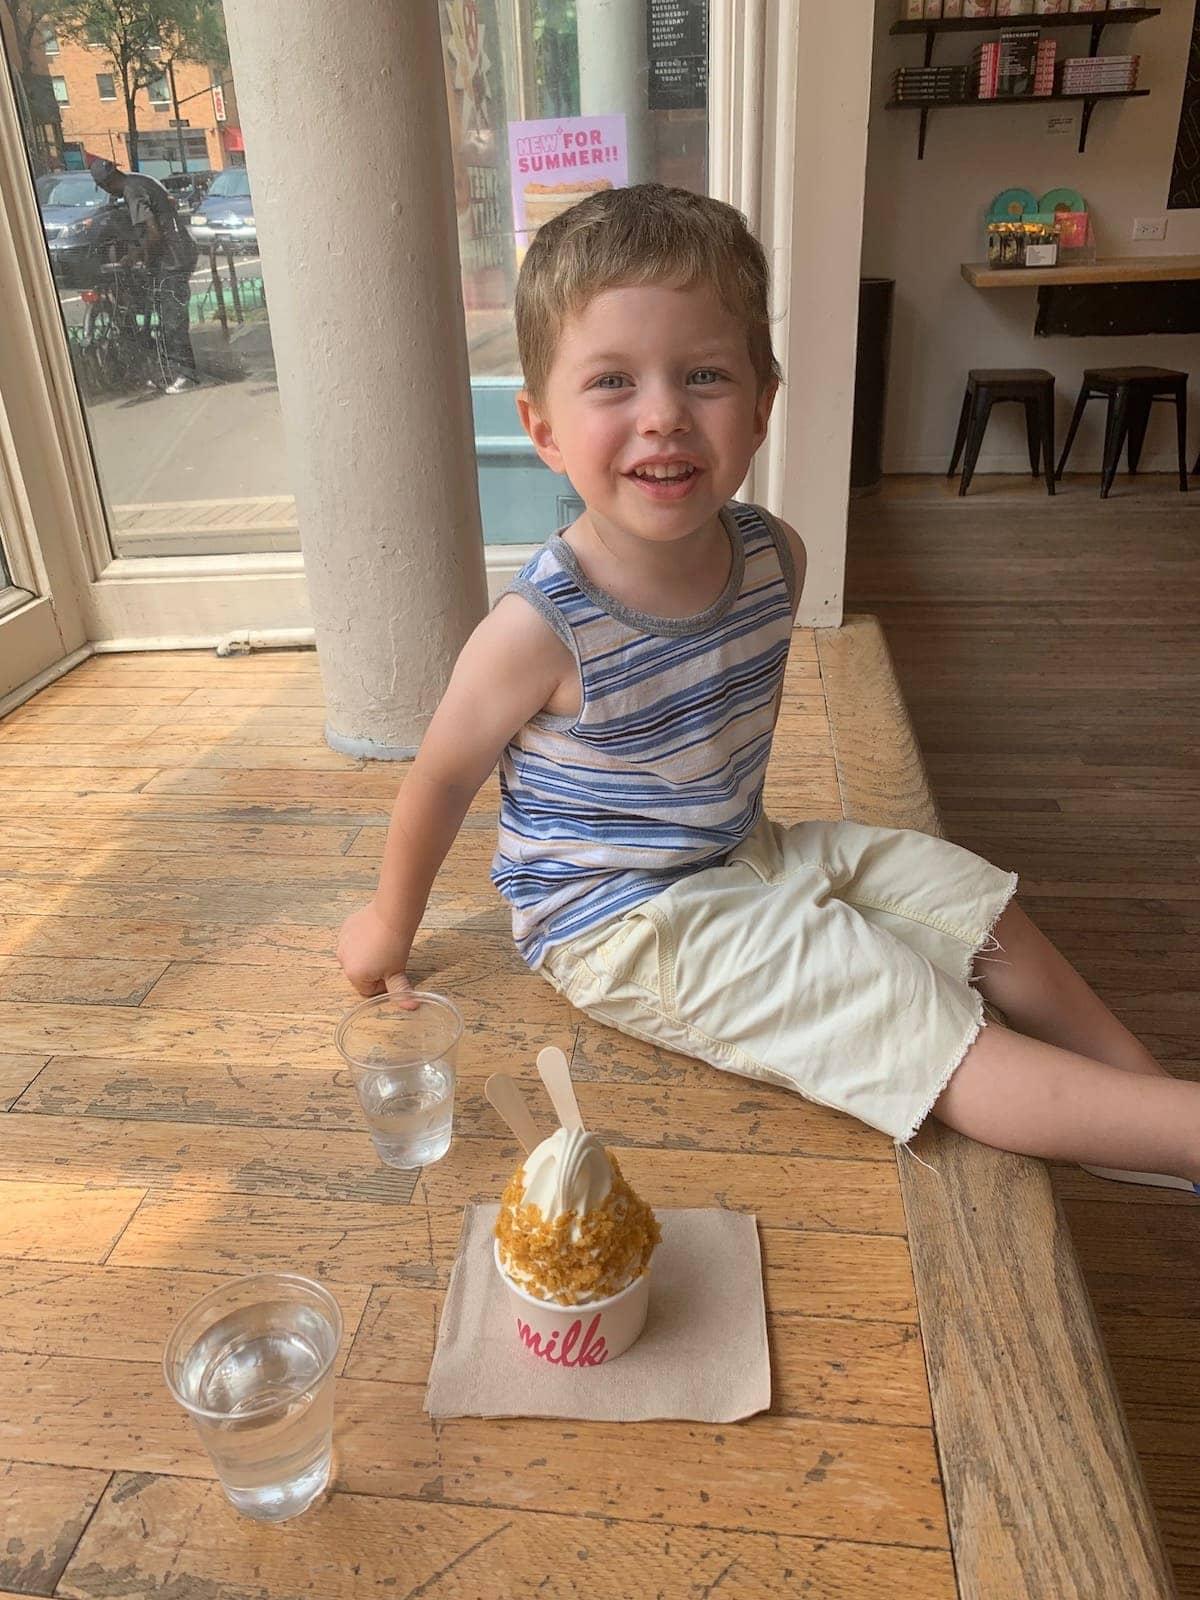 Eddie with milkbar ice cream